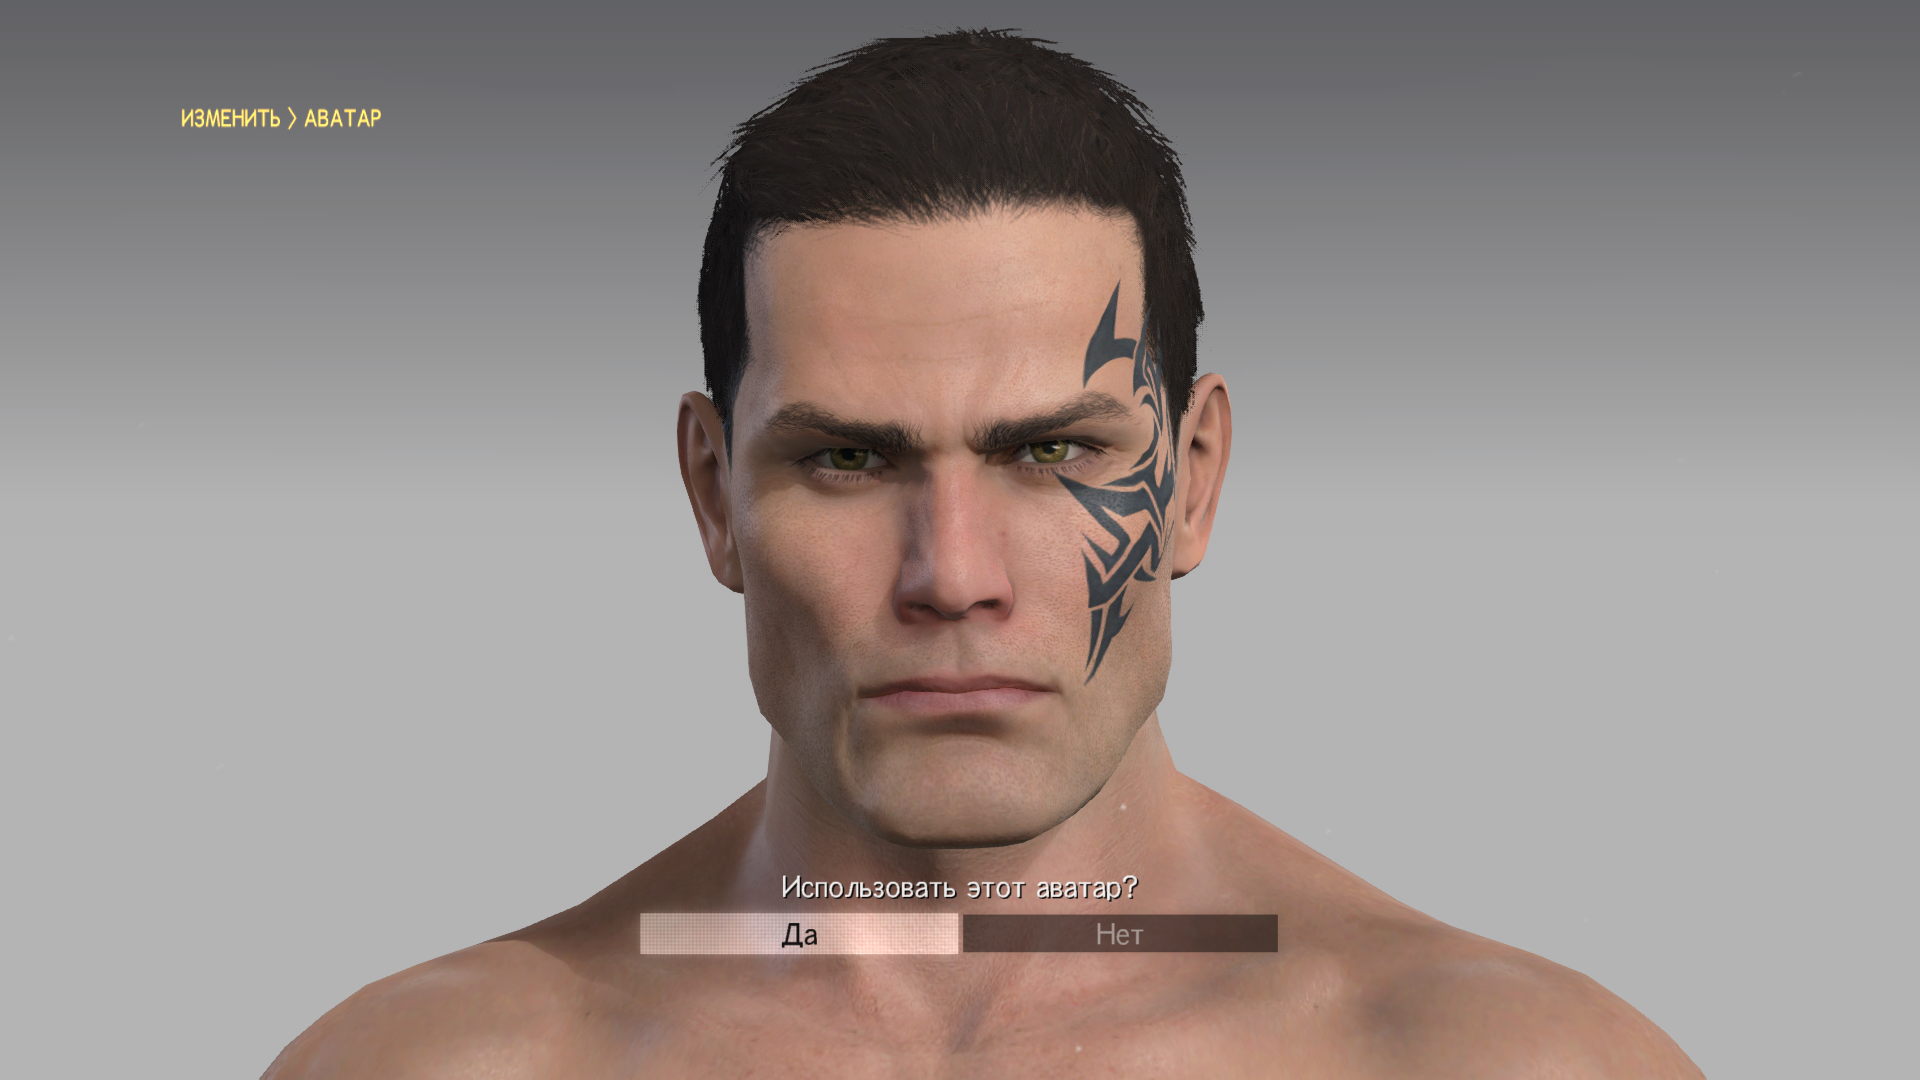 MGSV avatar by agentsniper